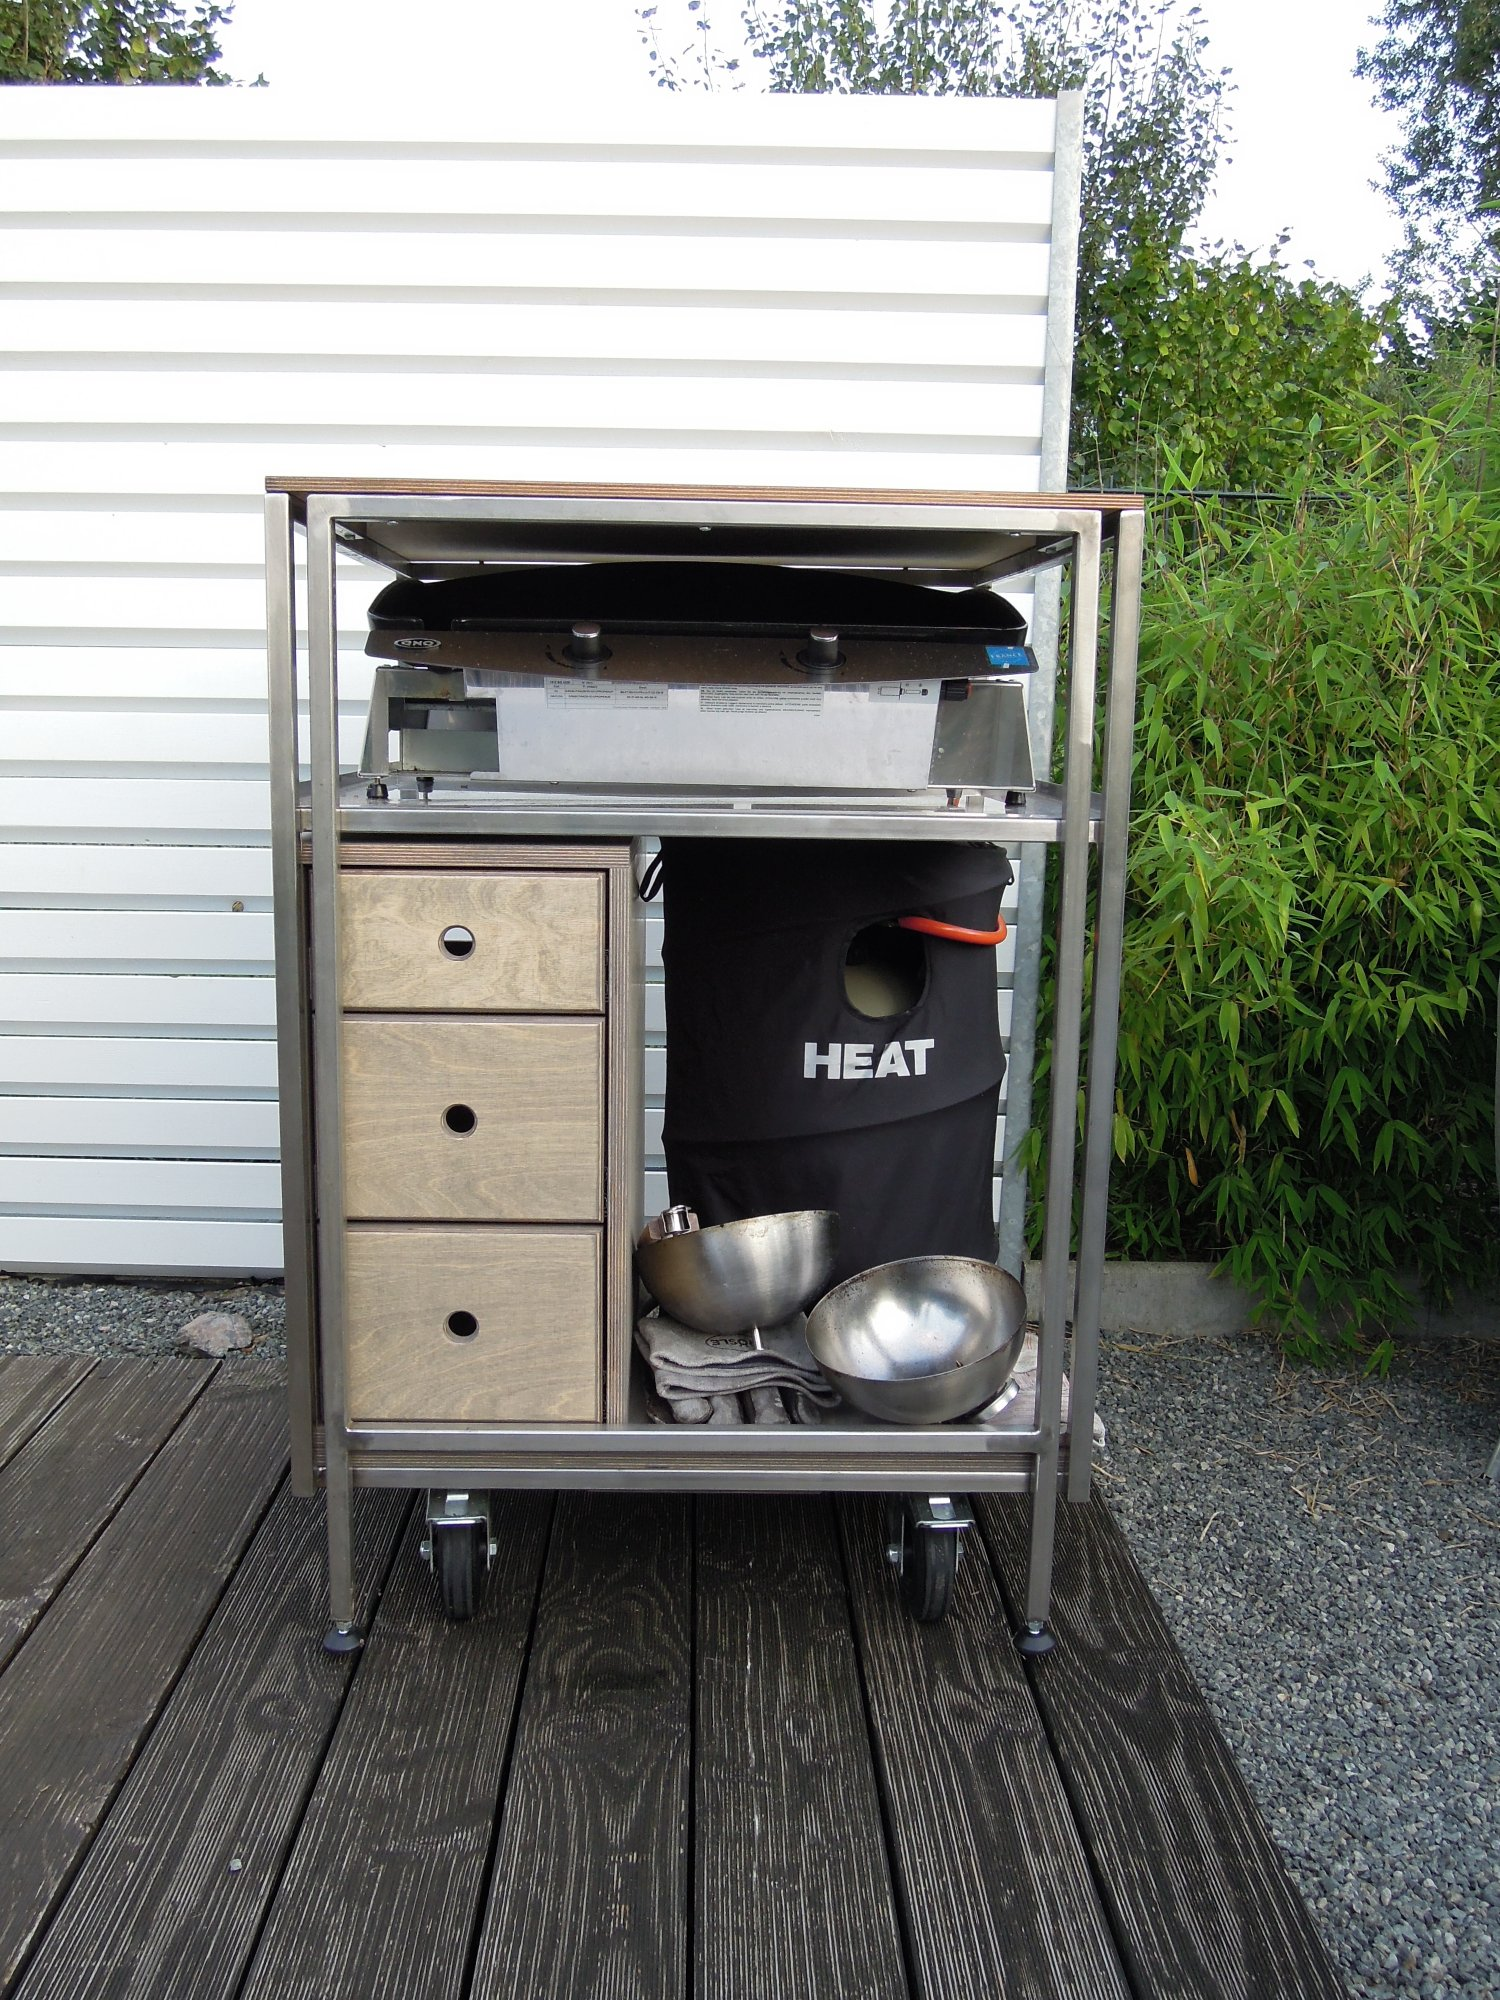 2 au enk chen module mit v2a rahmen hpl holz mit napoleon eno plancha sp le k hlschrank. Black Bedroom Furniture Sets. Home Design Ideas